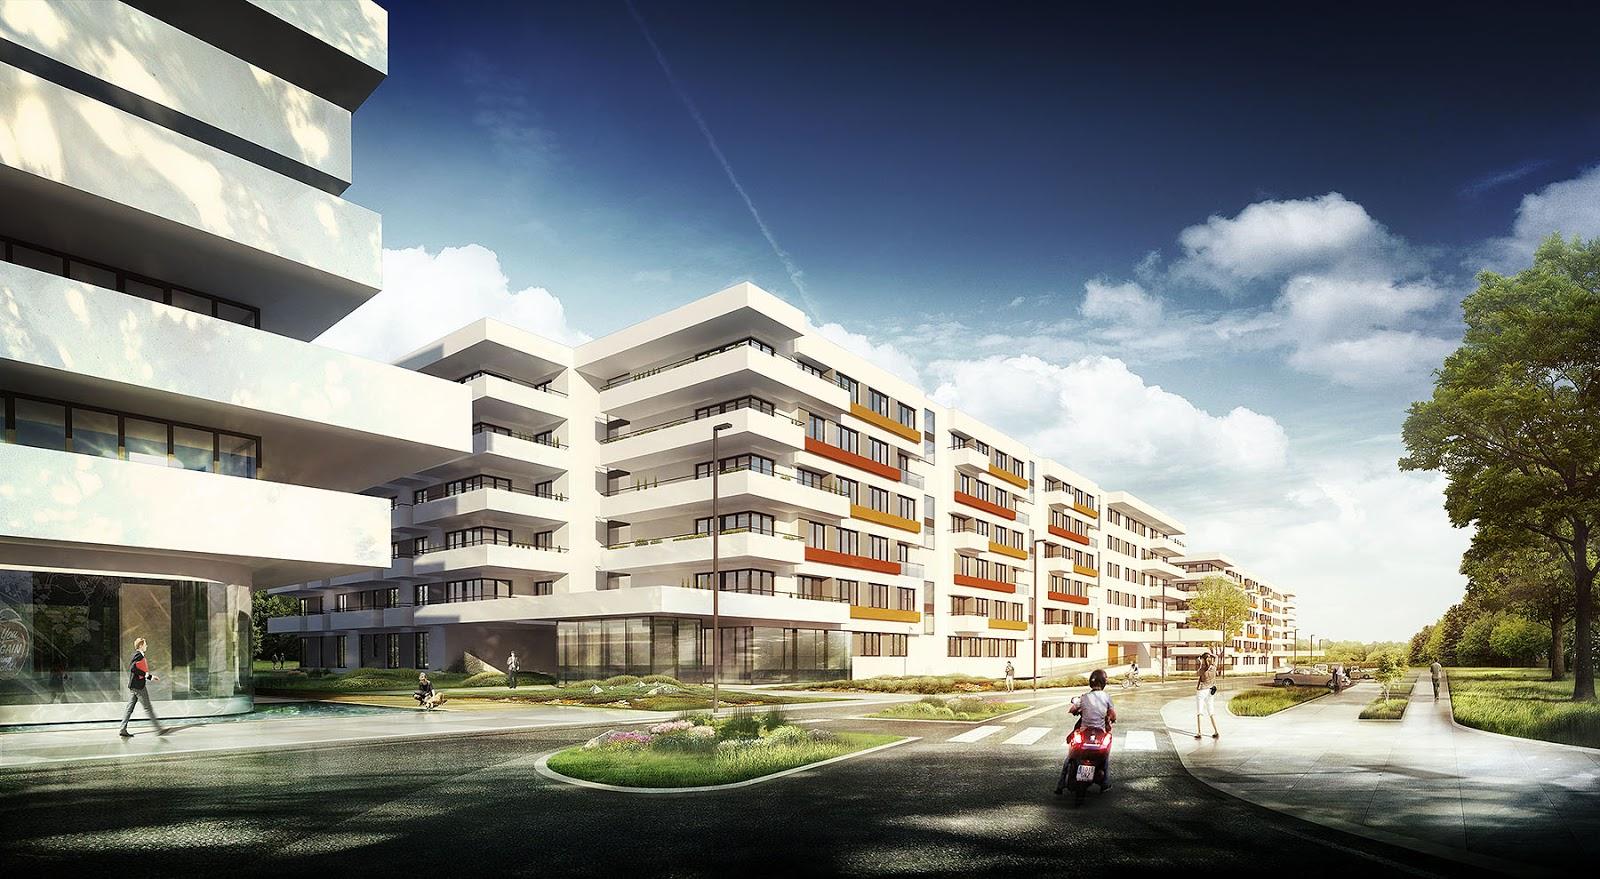 Uniquevisionstudio wizualizacja osiedla mieszkaniowego for Unique one